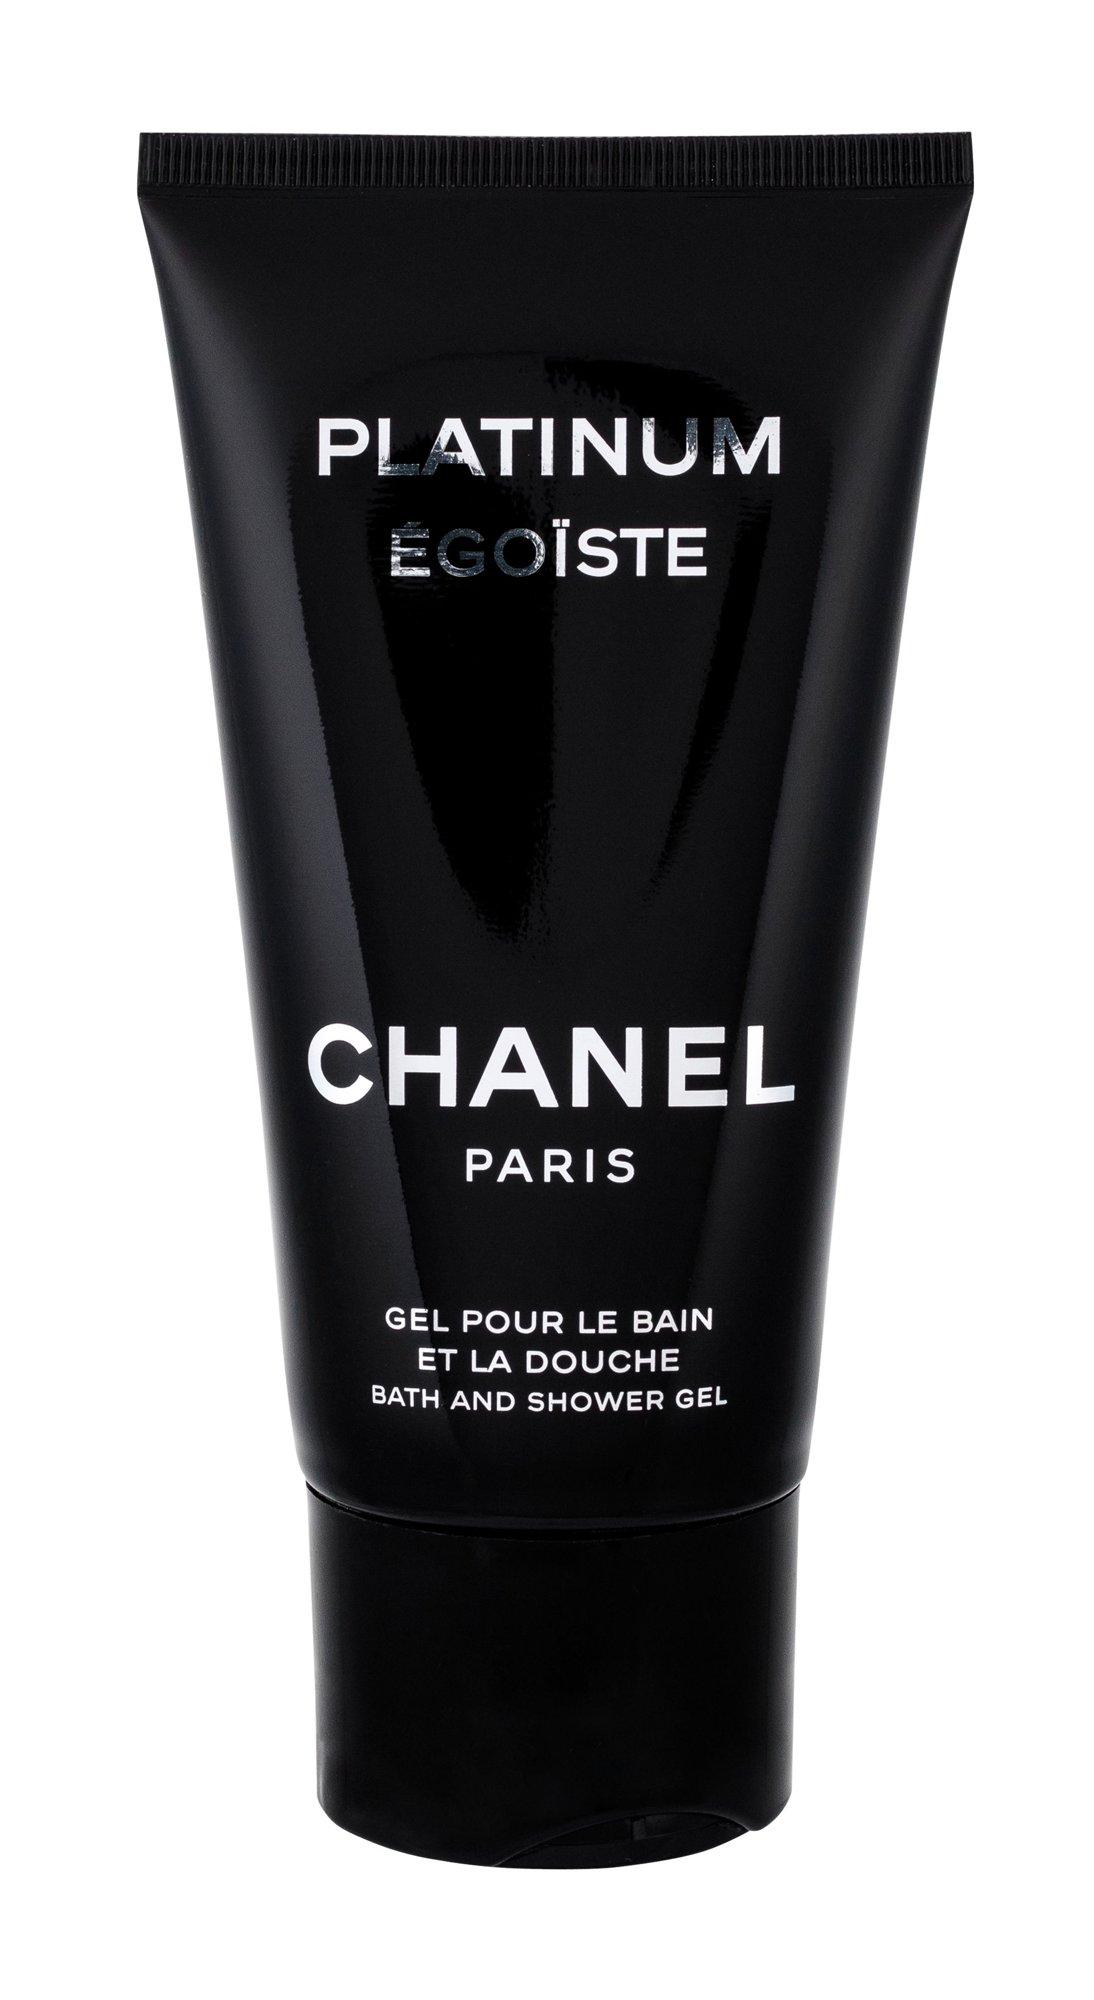 Chanel Platinum Egoiste Pour Homme Shower Gel 150ml